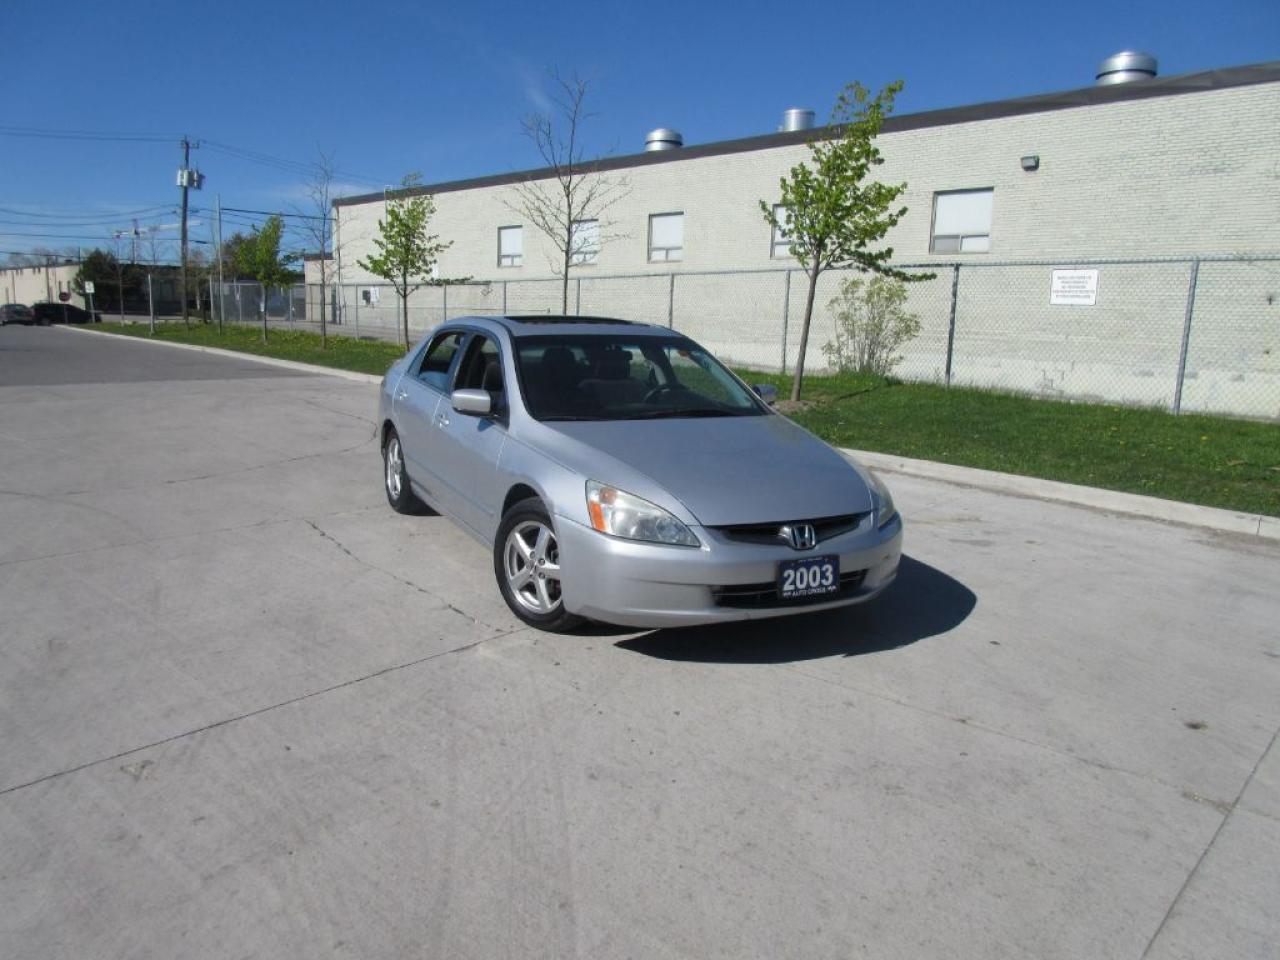 Photo of Silver 2003 Honda Accord 4 door, Sunroof, automatic, 3/Y warranty available